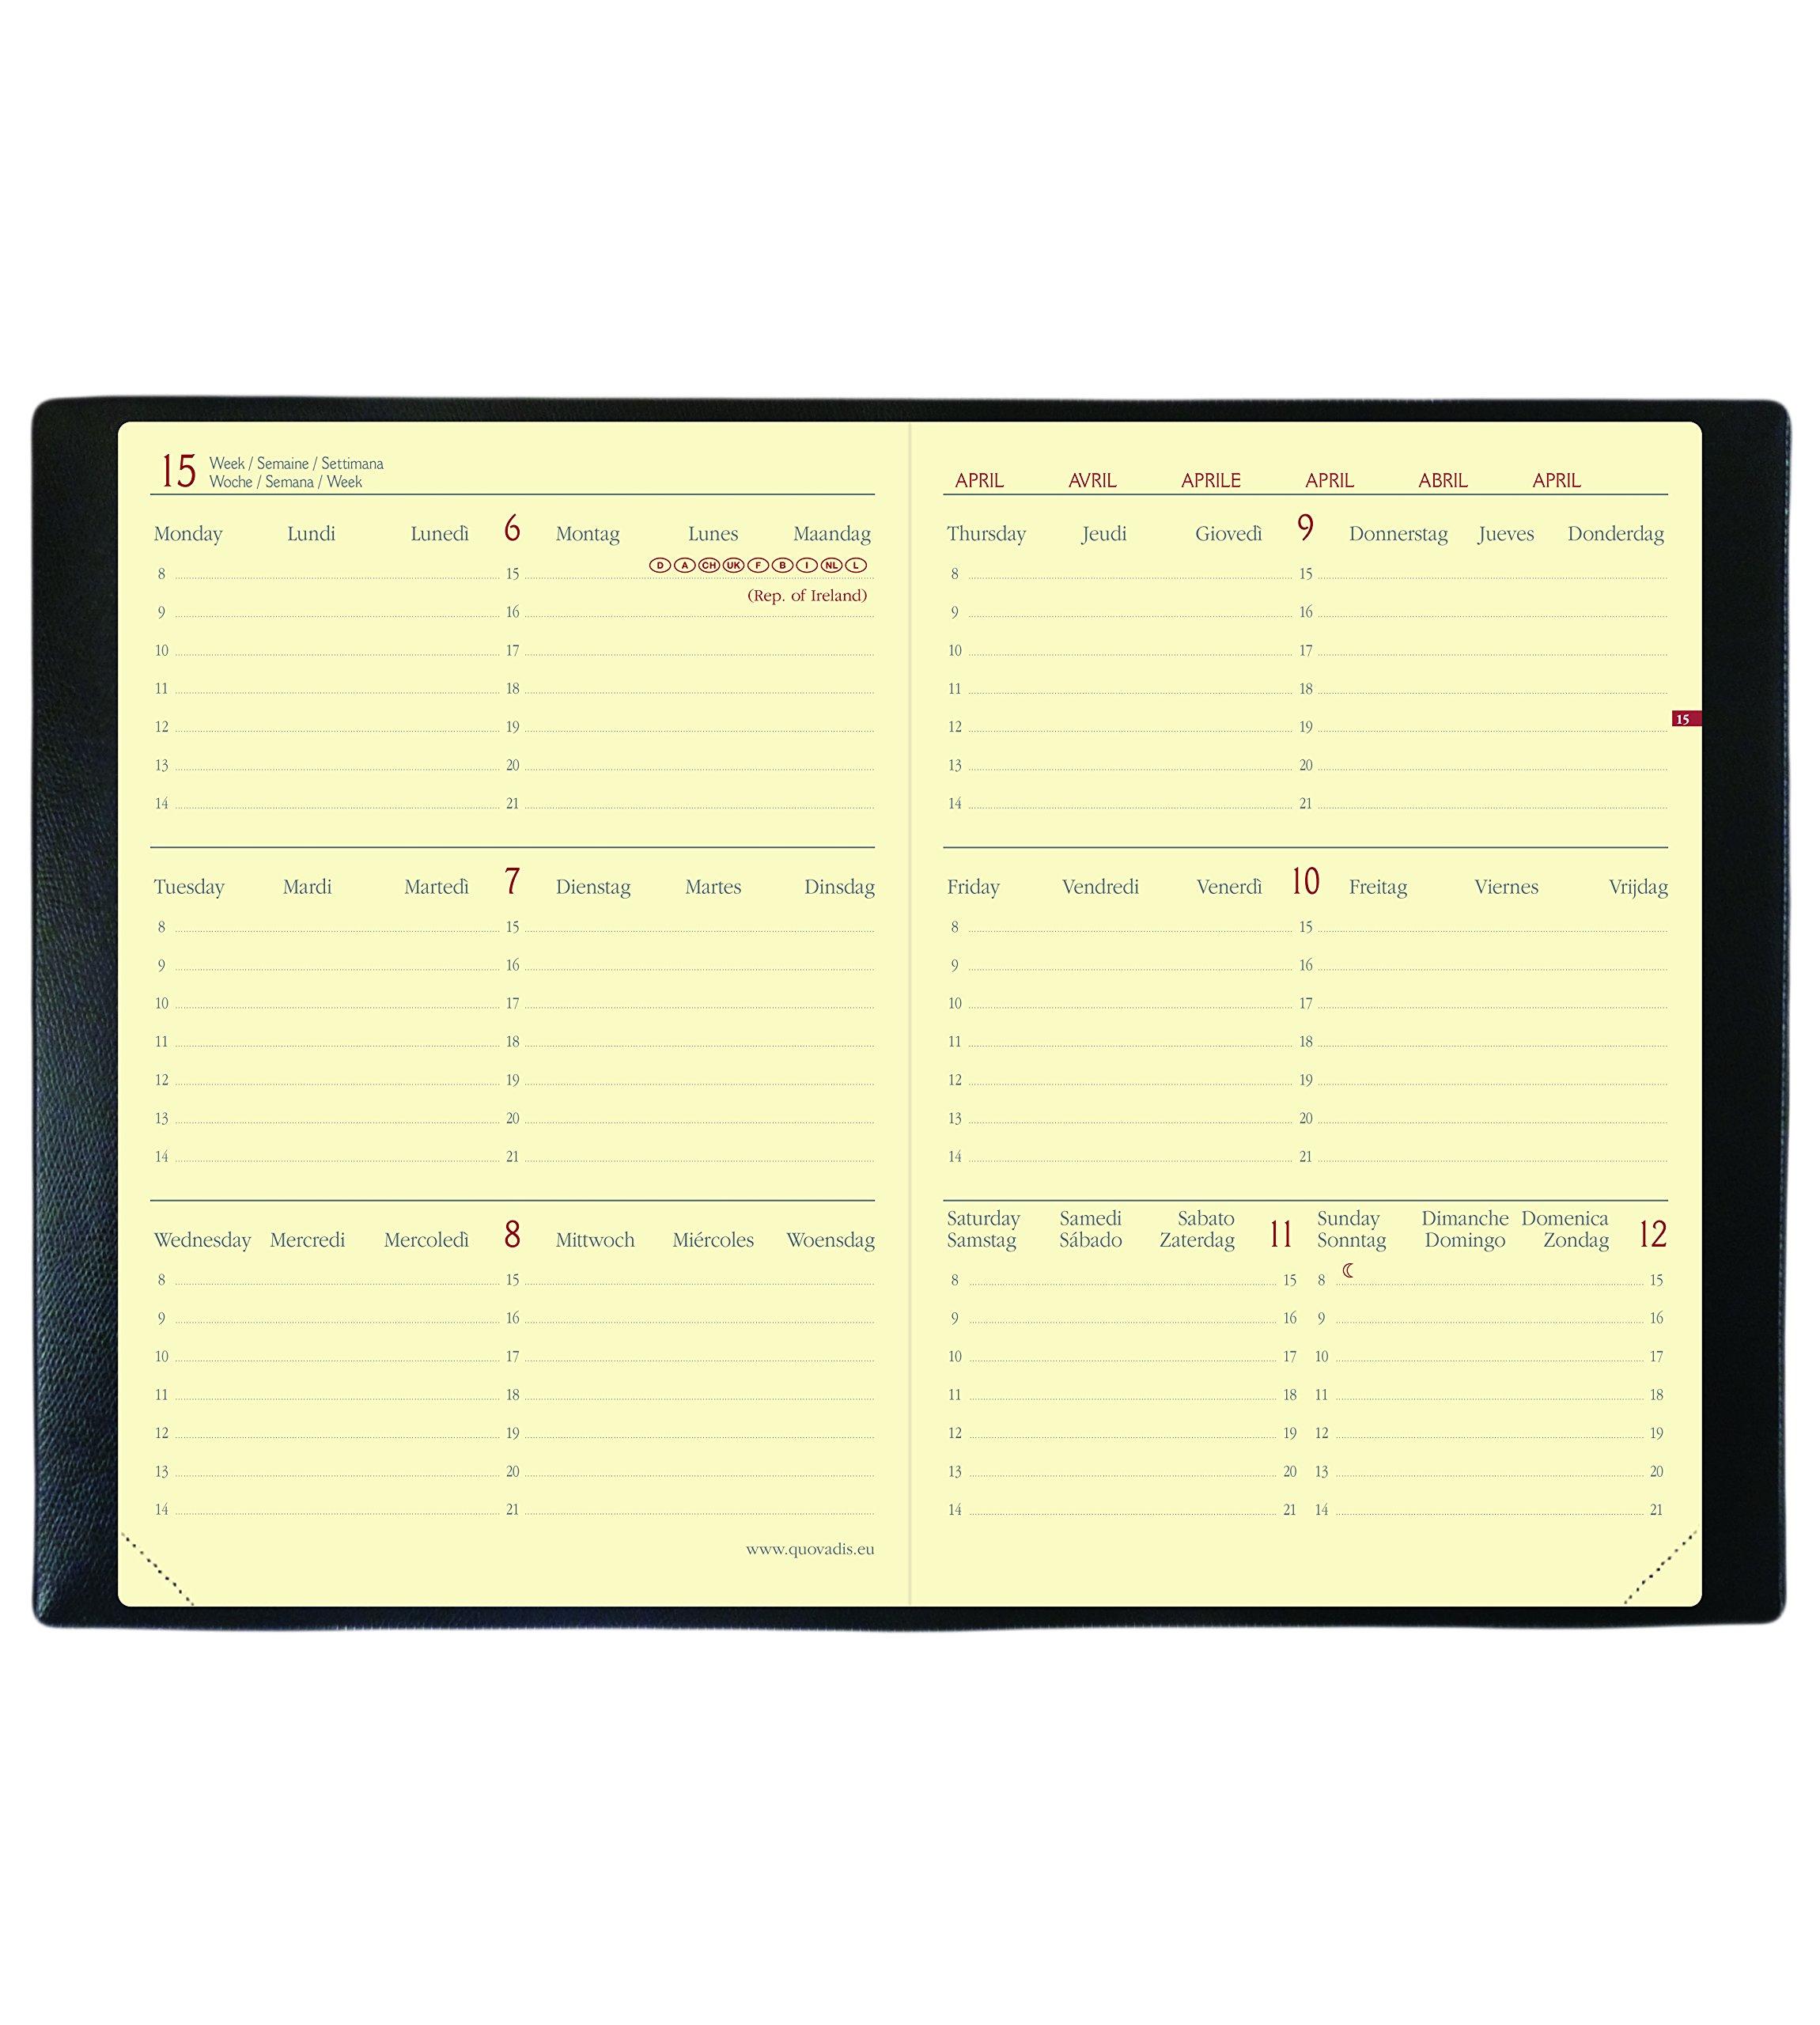 Quo Vadis Horizontal Velvet 15 SD September to December 549008q Academic Diary Year Diary with Elastic 10 x 15 cm 2017-2018 - Velvet Black by Quo Vadis (Image #5)